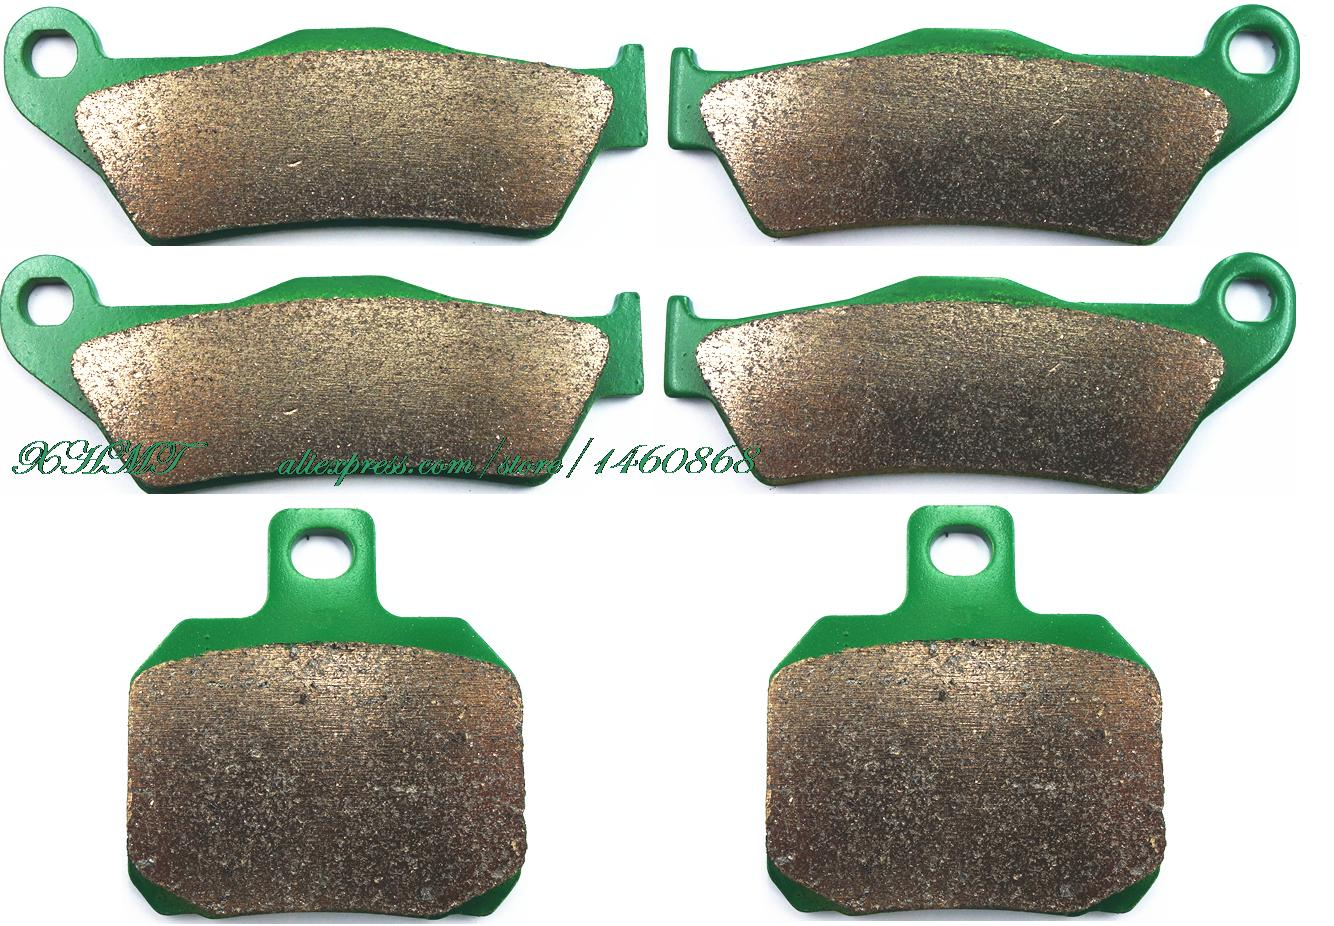 Brake Pads Set for PIAGGIO X9 500 2003 & up/ GILERA NEXUS 500 2004 & up/ DUCATI MONSTER 695 2006 2007 2008 крепеж багажа kappa для скутера piaggio vespa 300 super с 2008 г серый черный